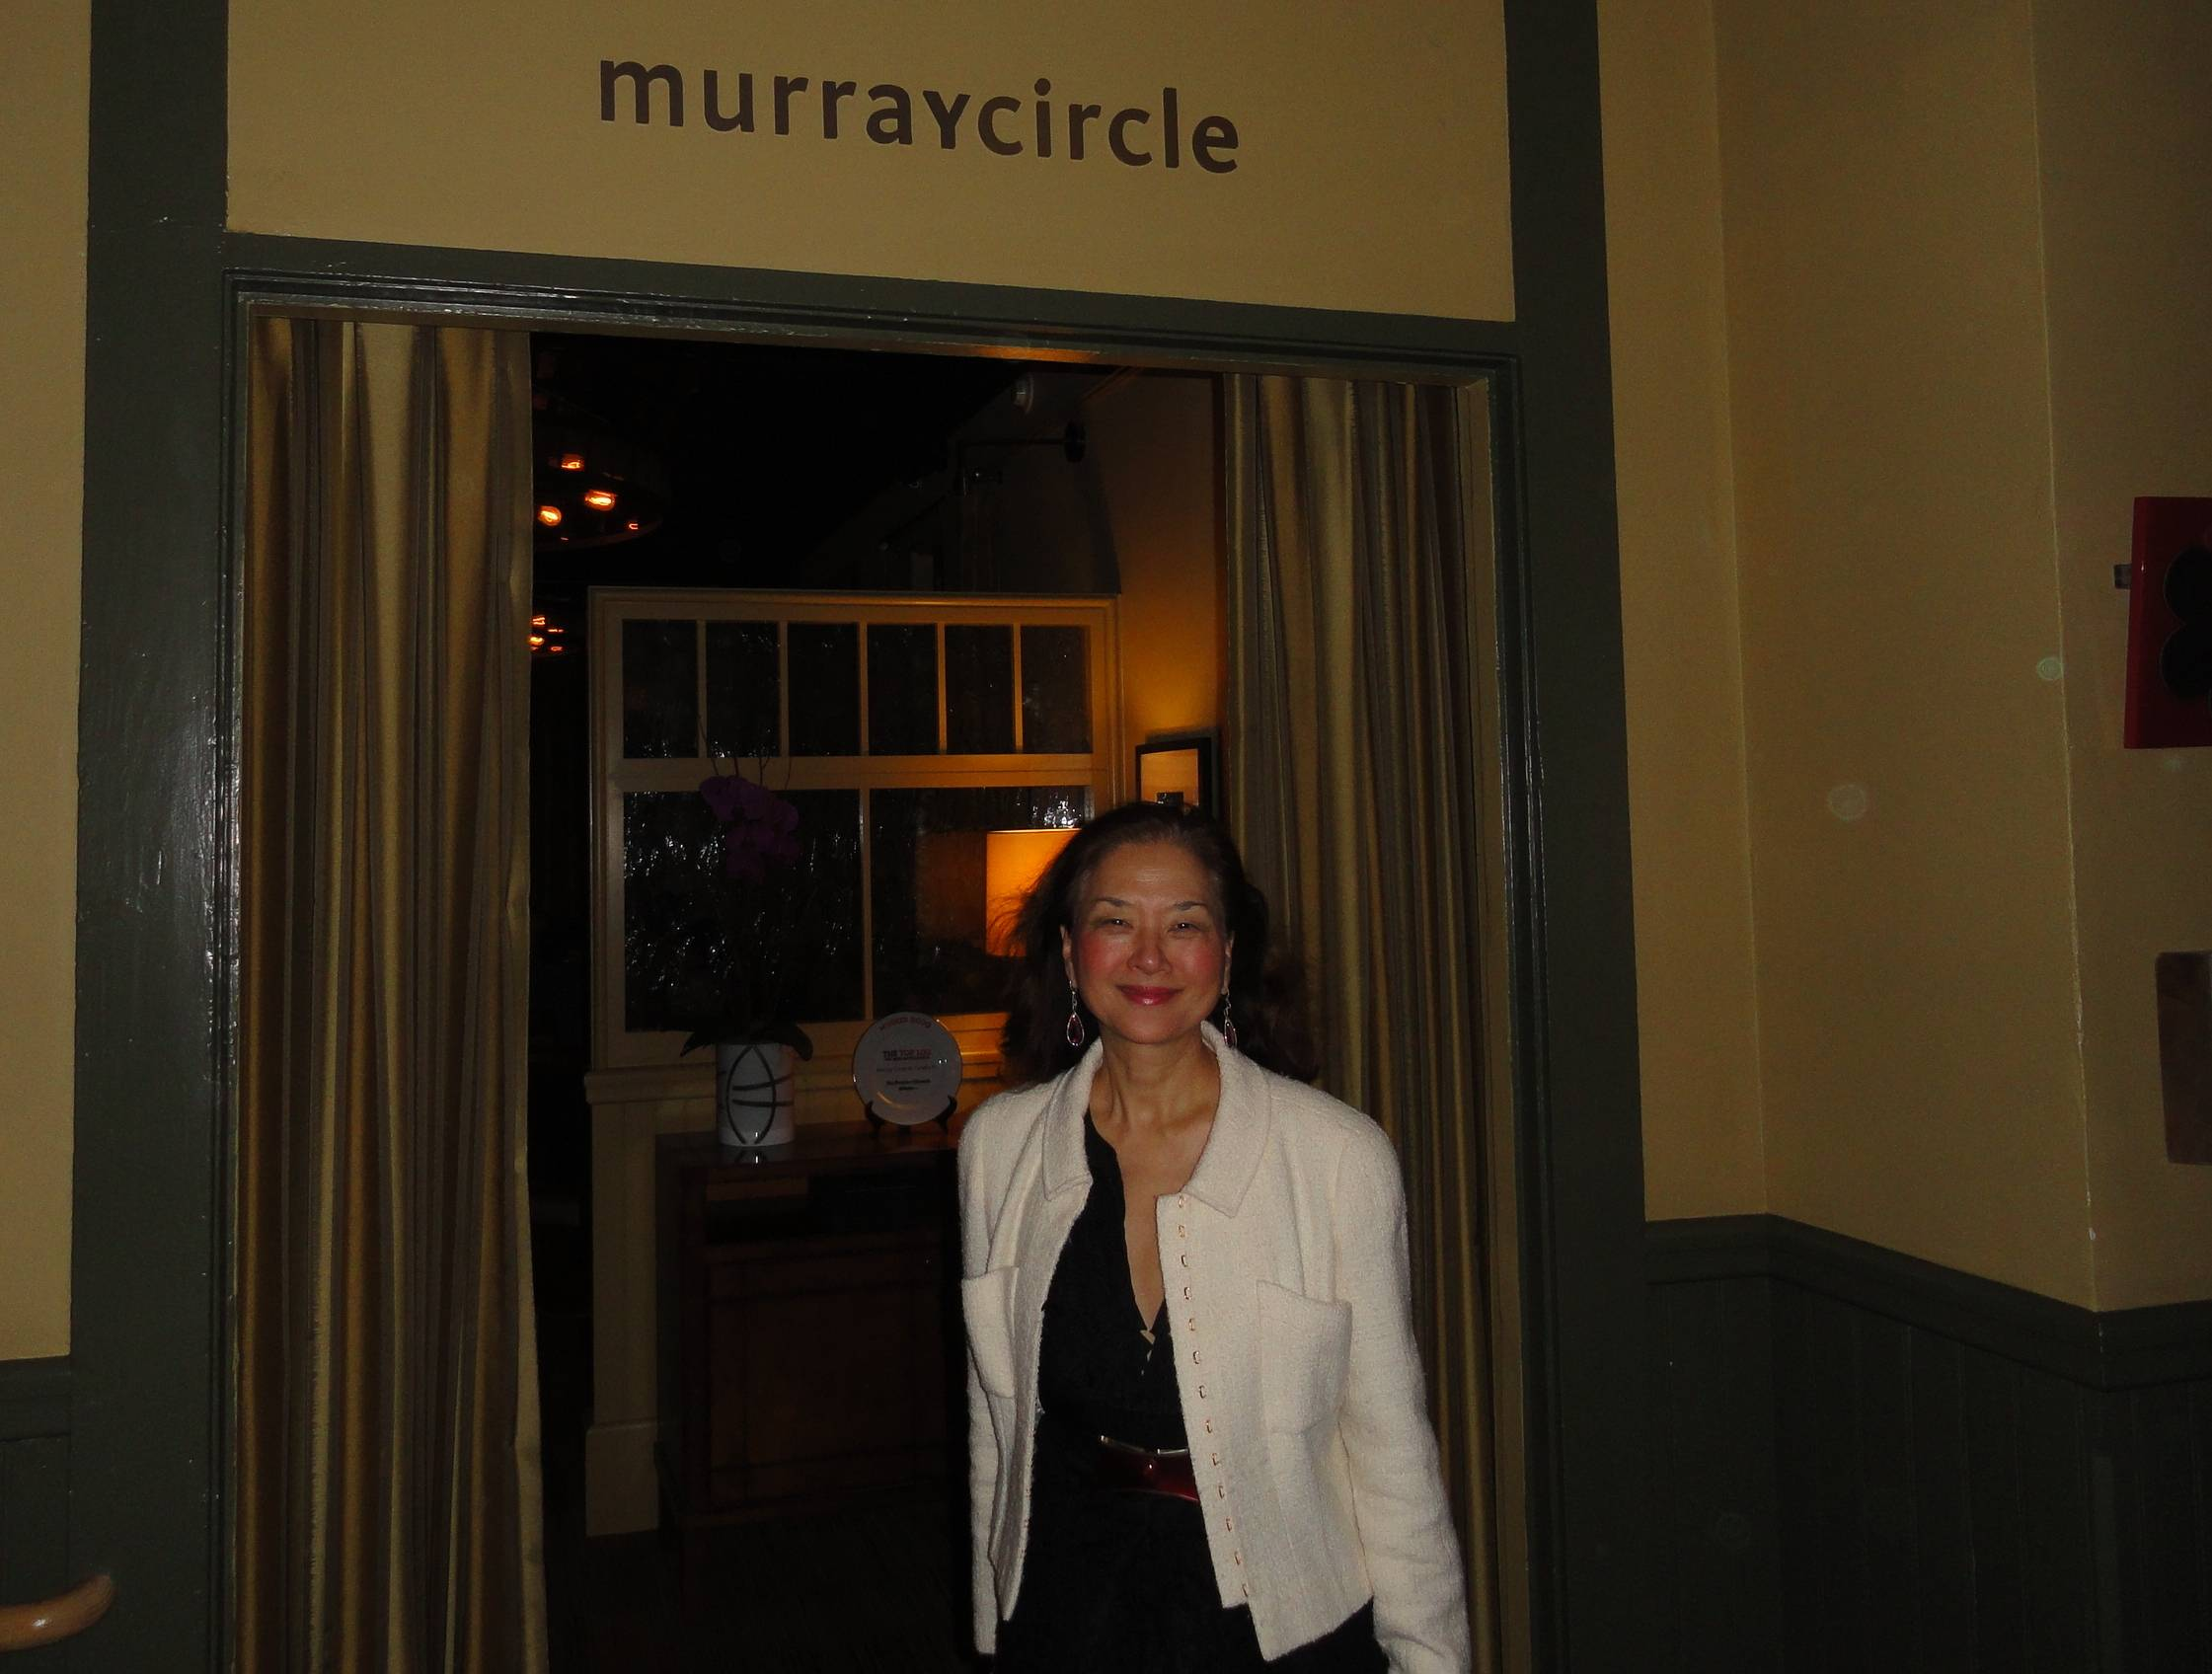 cavallo point lodge two michelin star restaurant murray circle